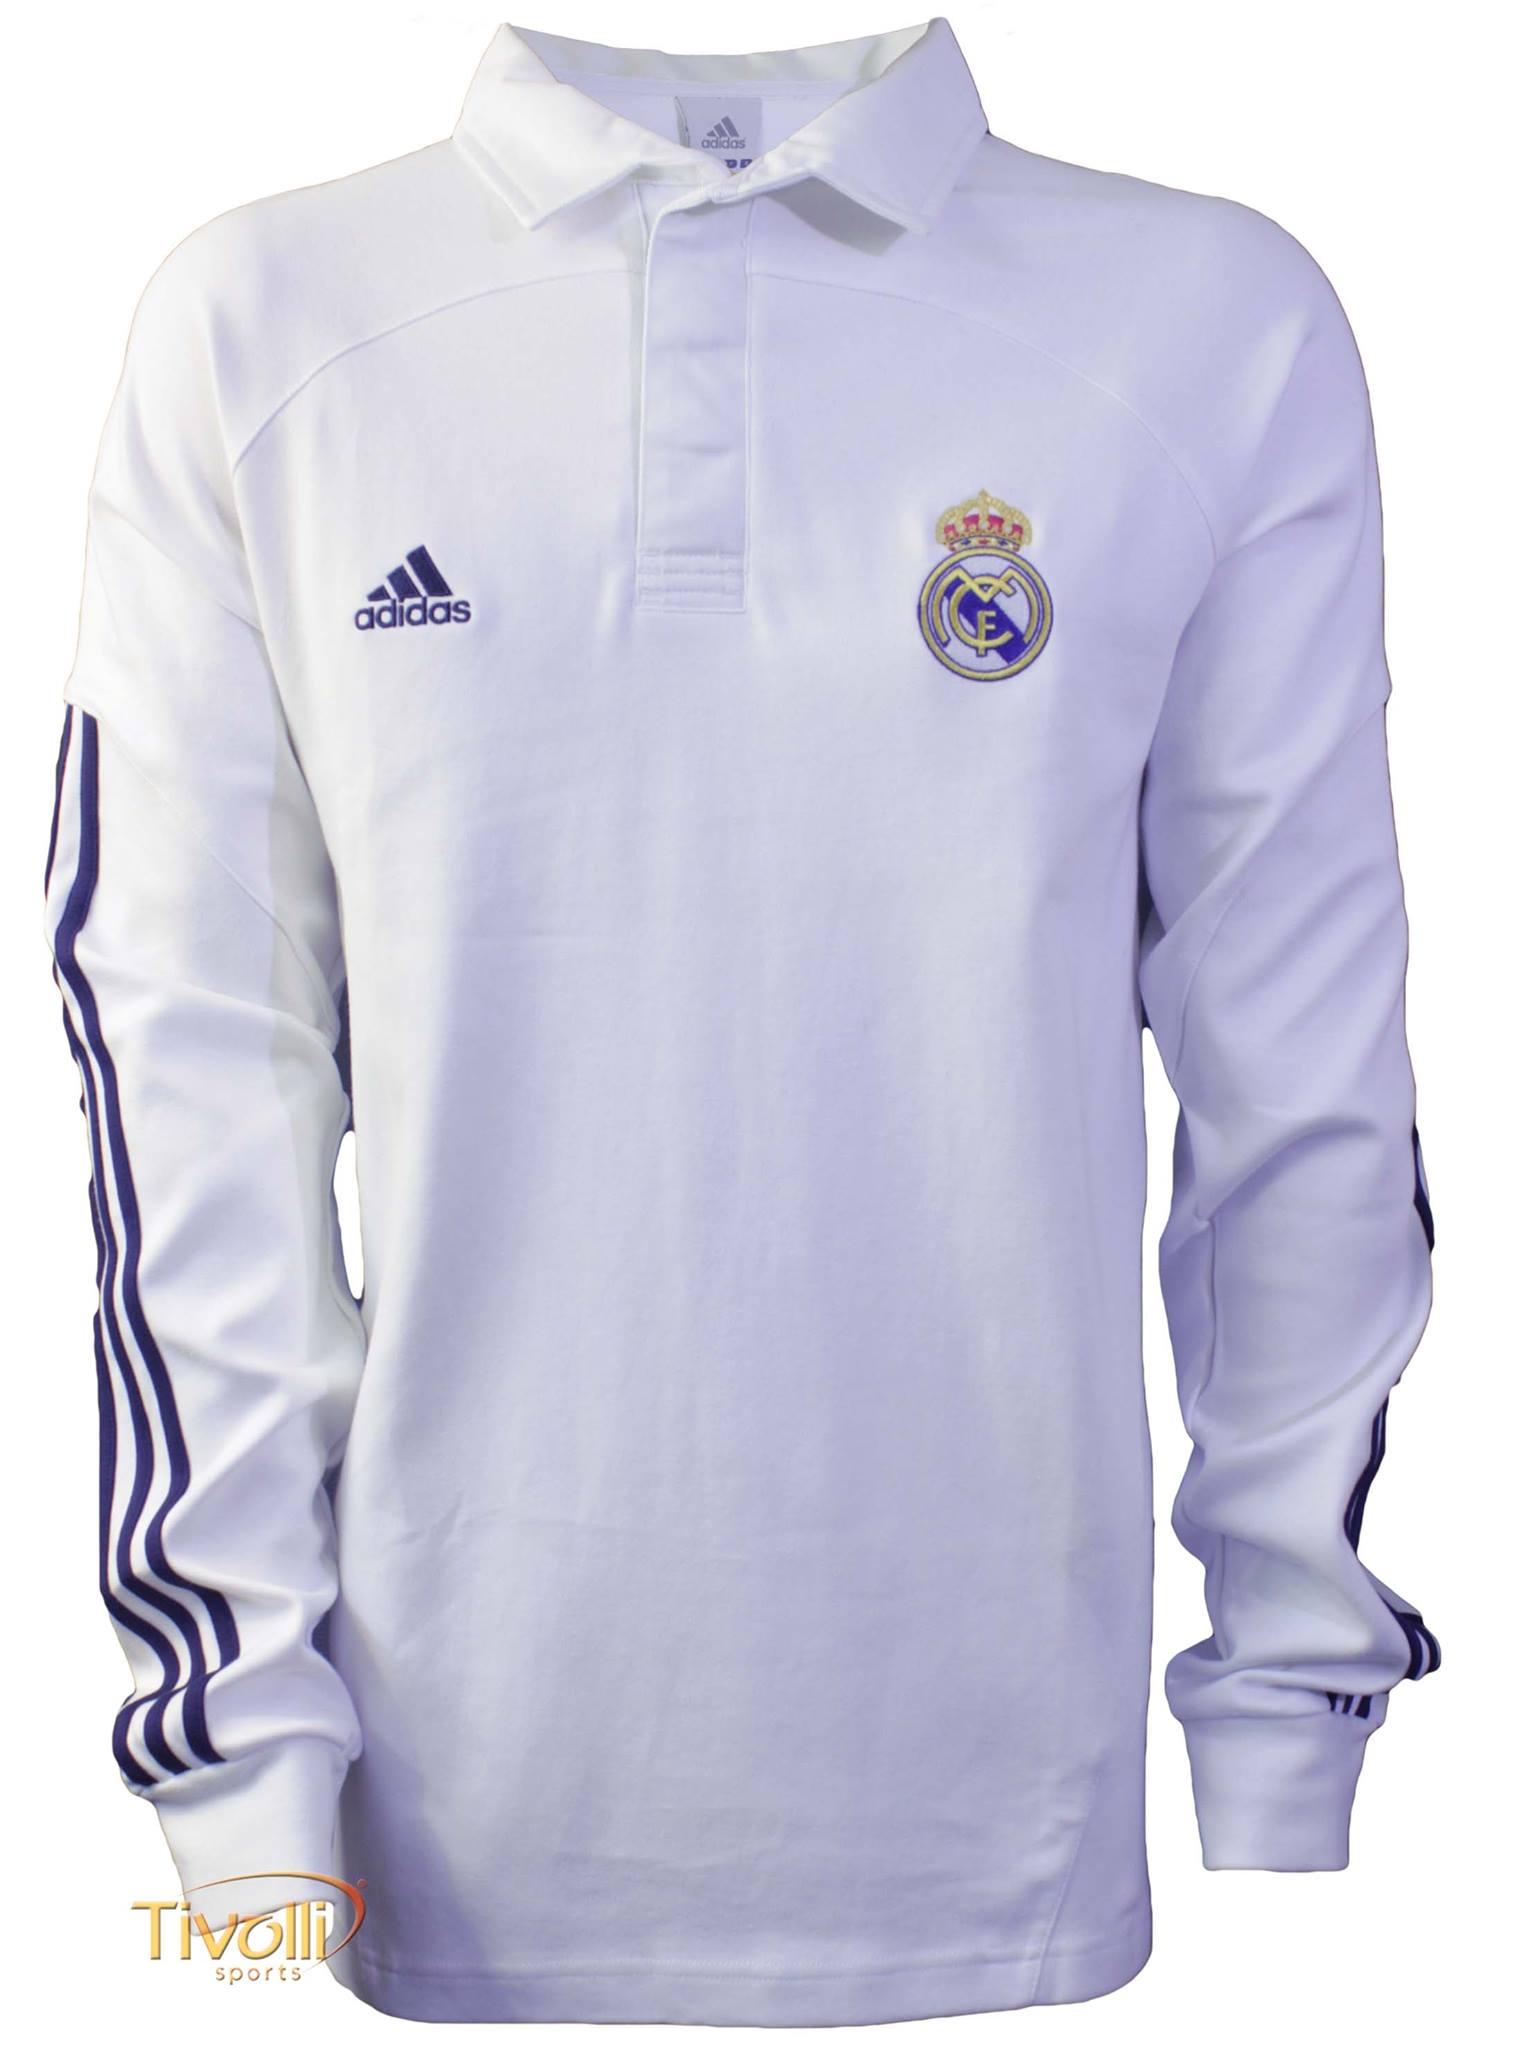 Black Friday - Camisa Polo Viagem Real Madrid Adidas Masculina Branca Manga  Longa e2bc3ffabfdd5